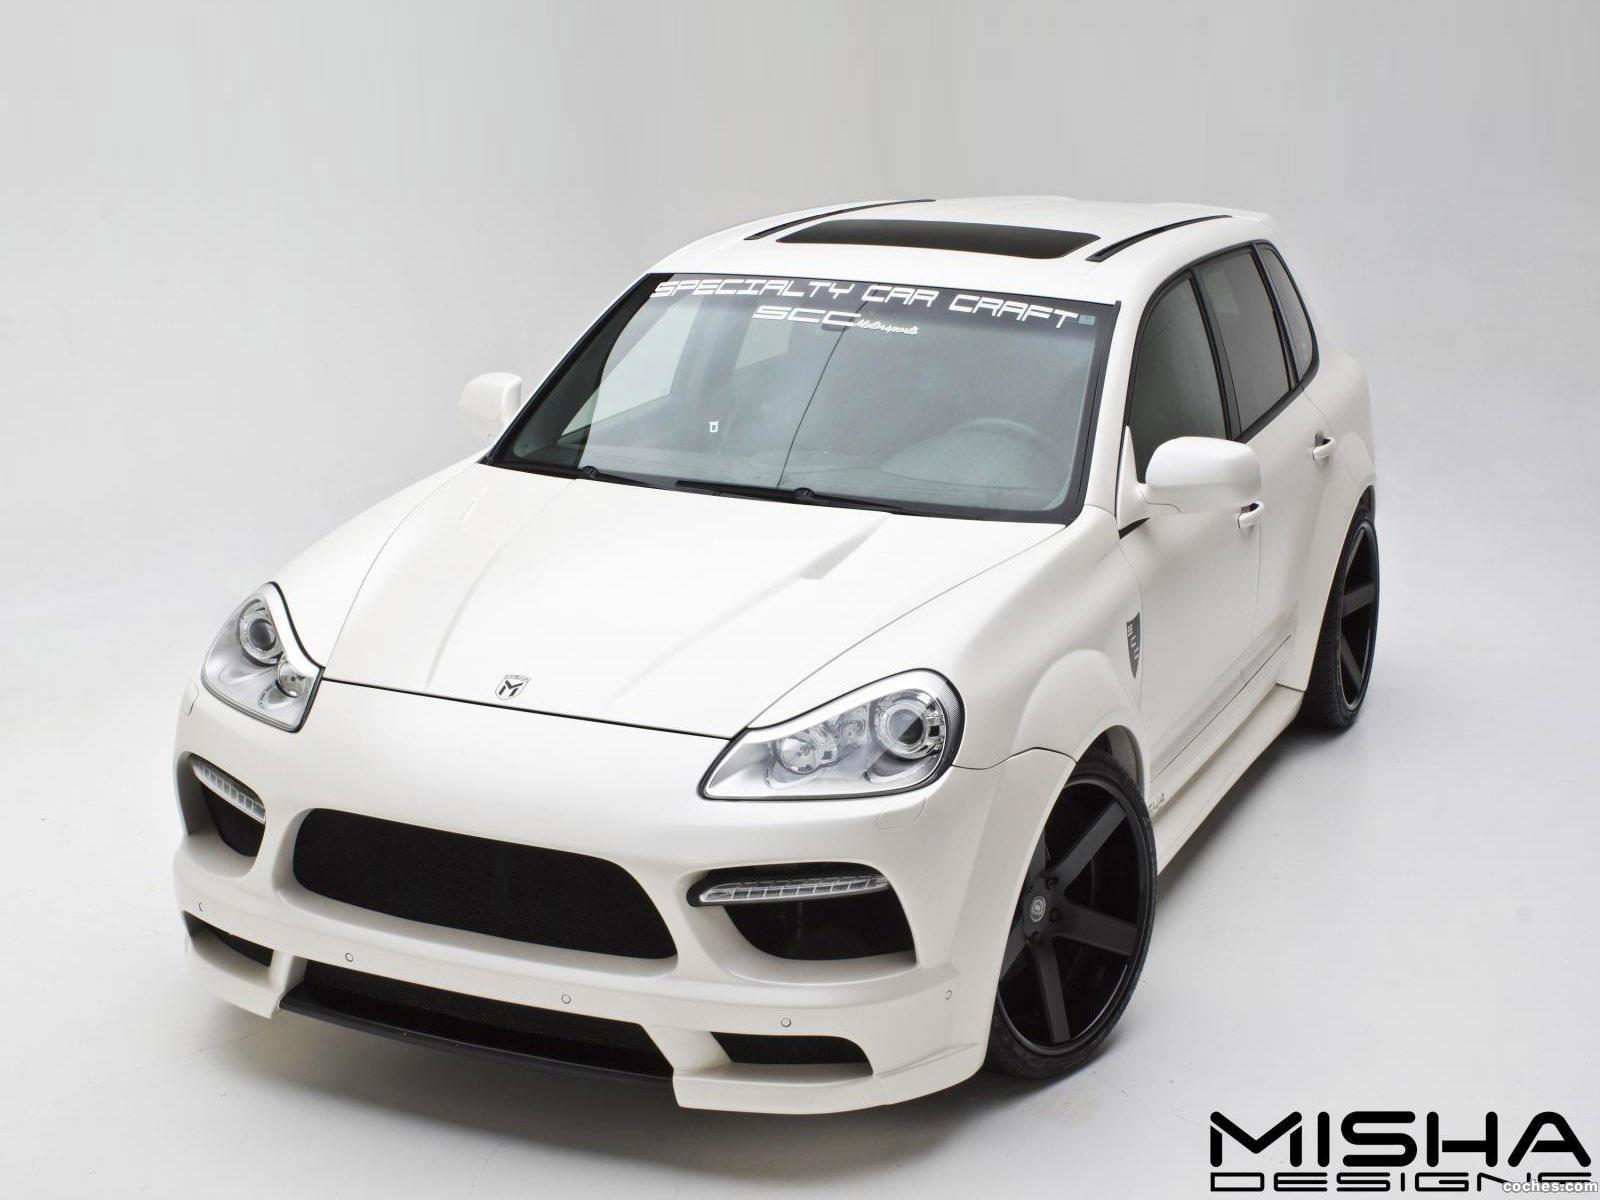 Foto 7 de Misha Porsche Cayenne Wide Body 2013